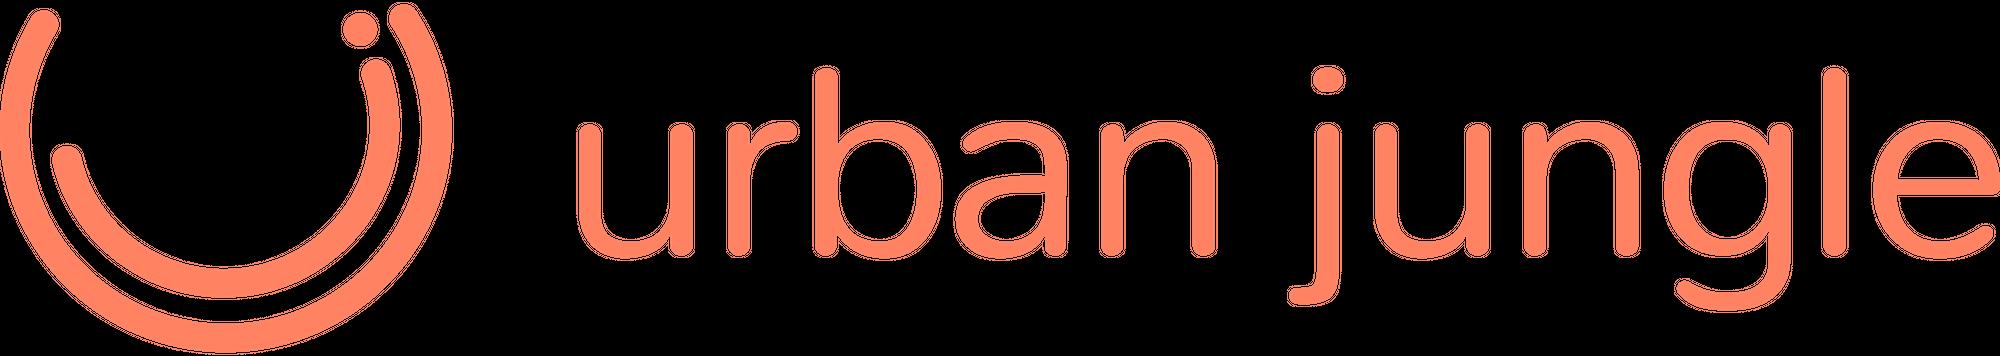 UJ-logo_orange-1